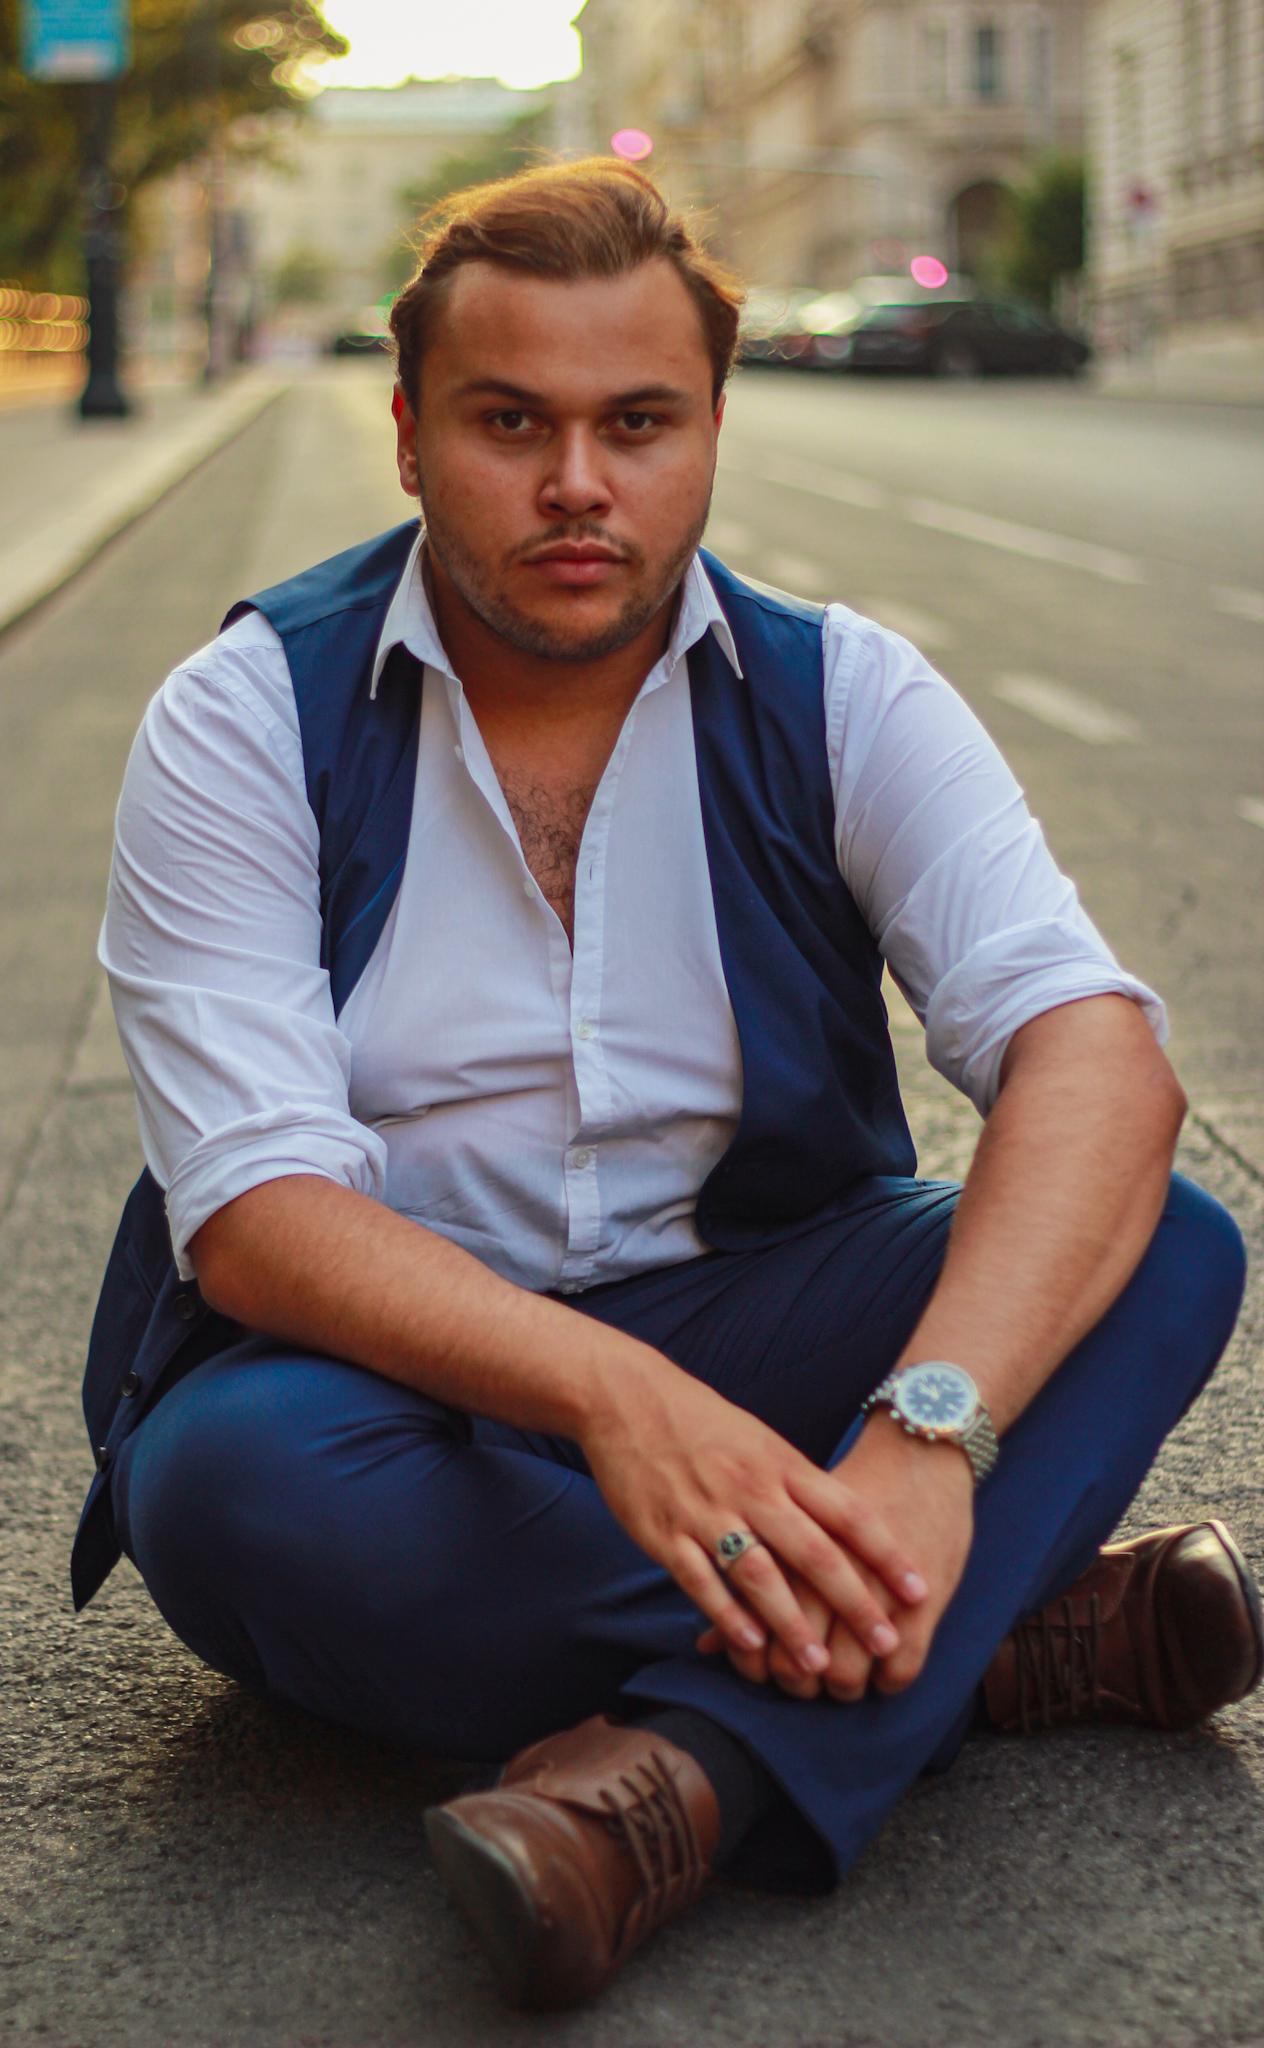 Photo and Copyright by Alduin Gazquez